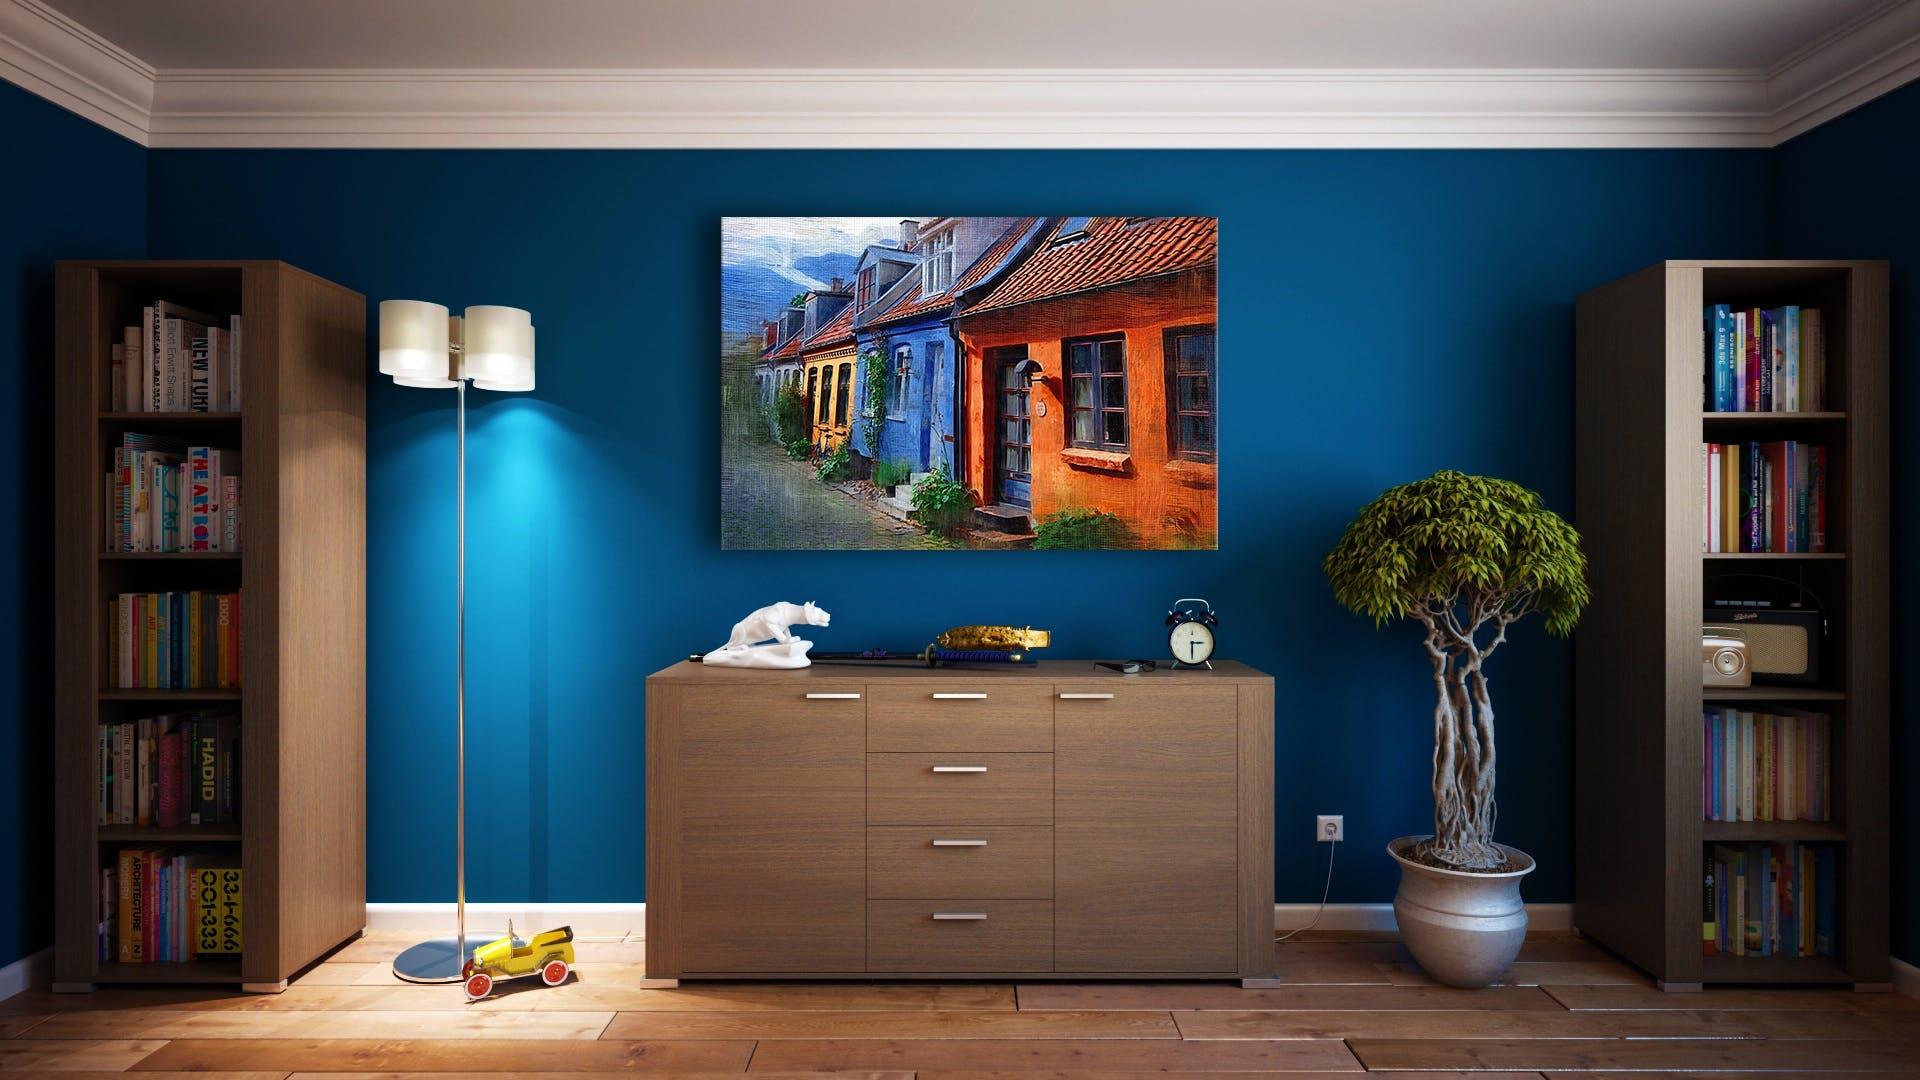 Kostenloses Stock Foto zu architektur, bücherregal, bücherregale, dekoration